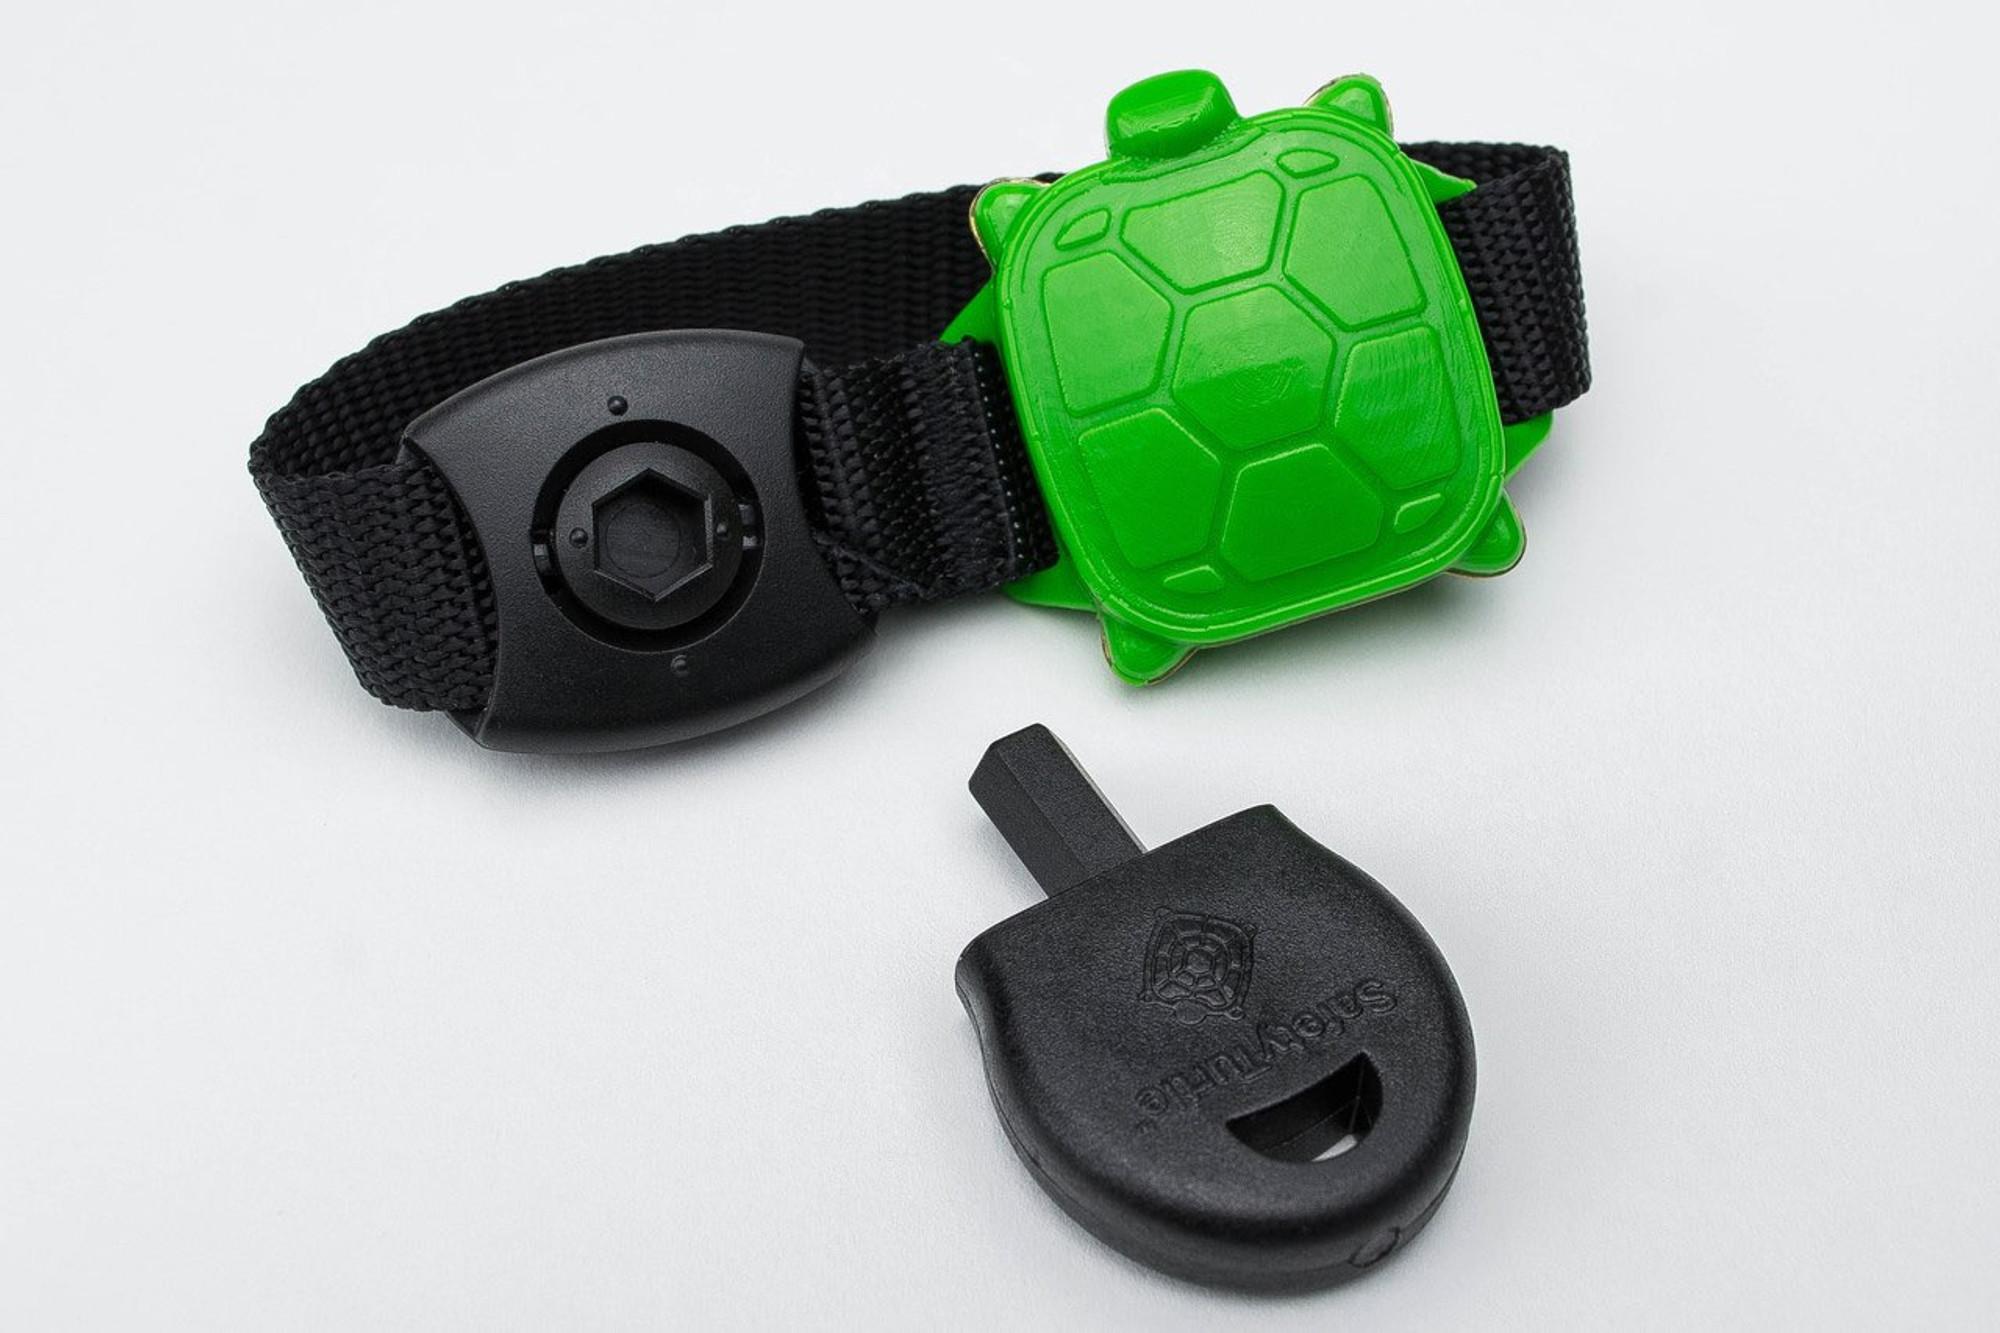 Swimming Turtle Swimming Pool Alarm Brickhouse Security